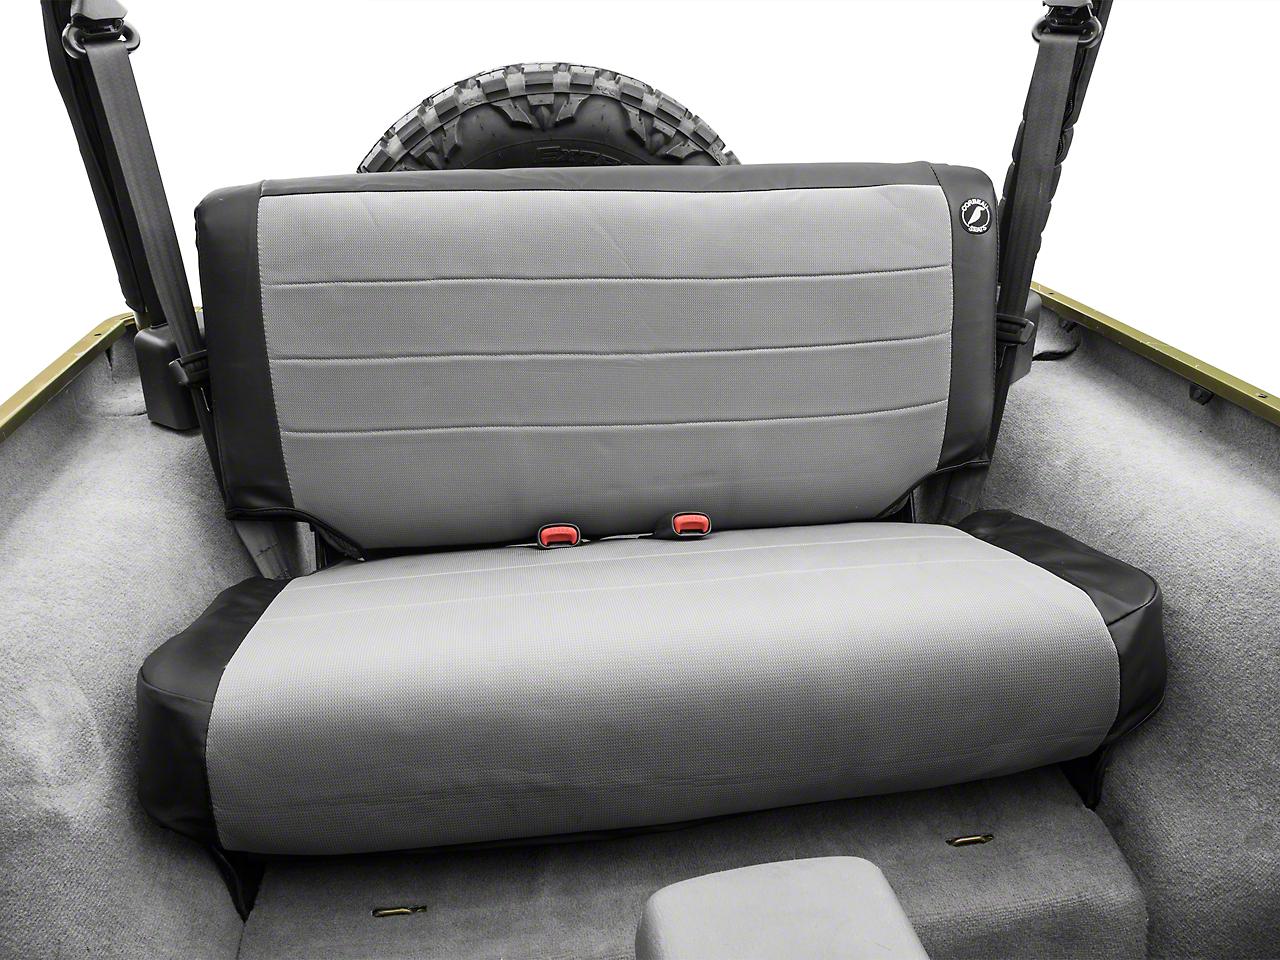 Corbeau Rear Seat Cover - Black Vinyl/Gray Cloth (97-06 Jeep Wrangler TJ)